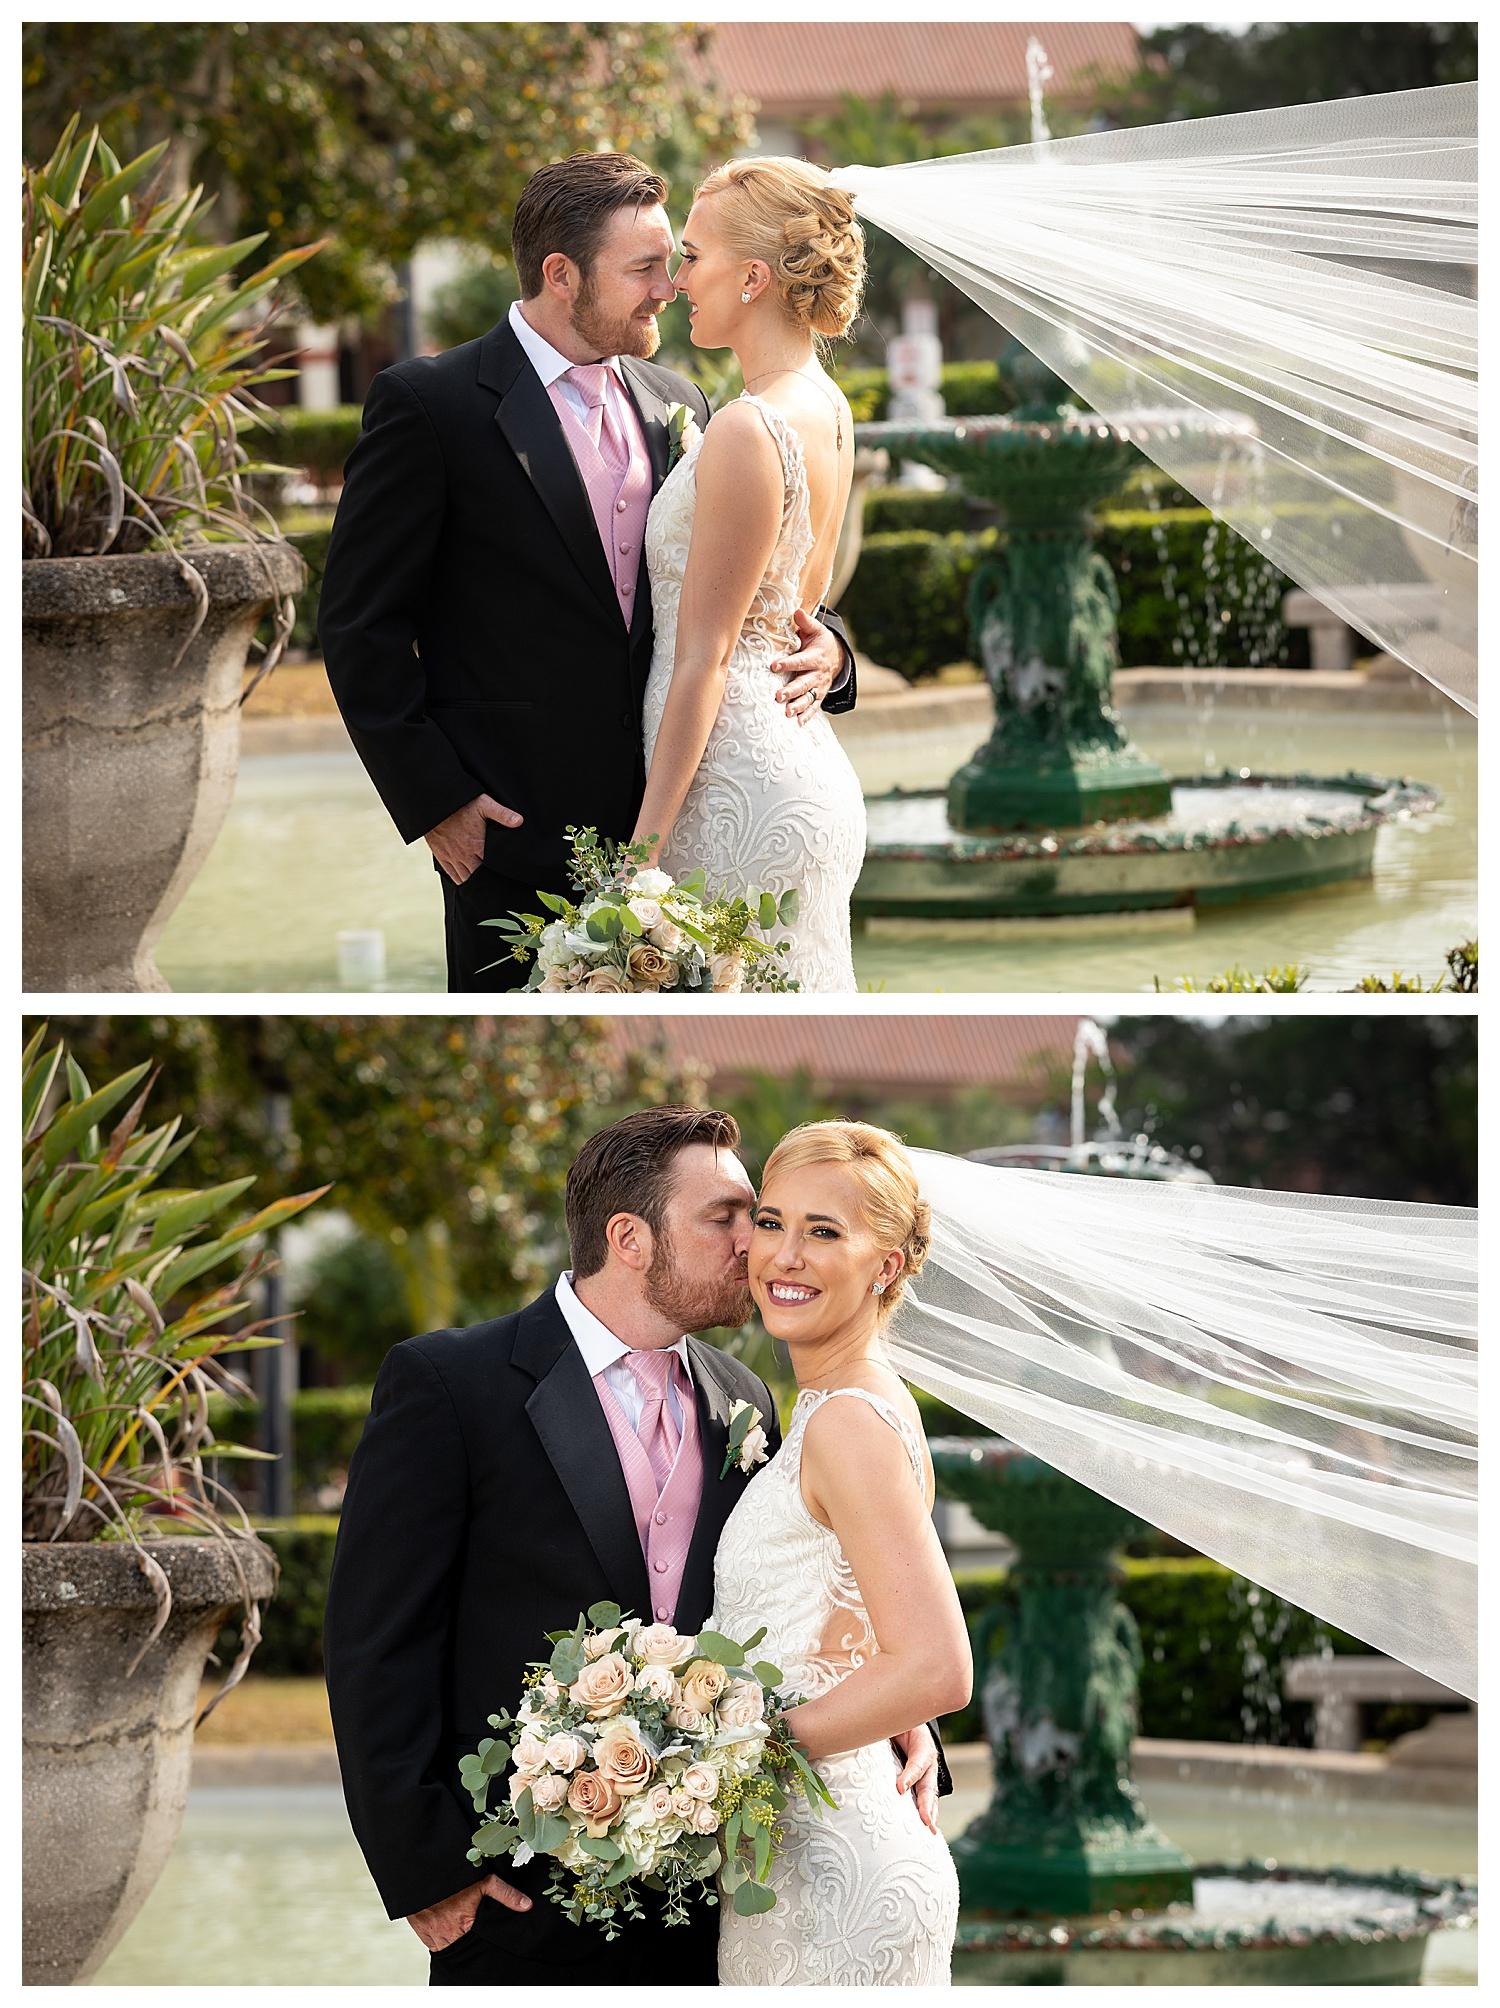 St. Augustine Wedding - Amore Wedding Chapel - 047.JPG